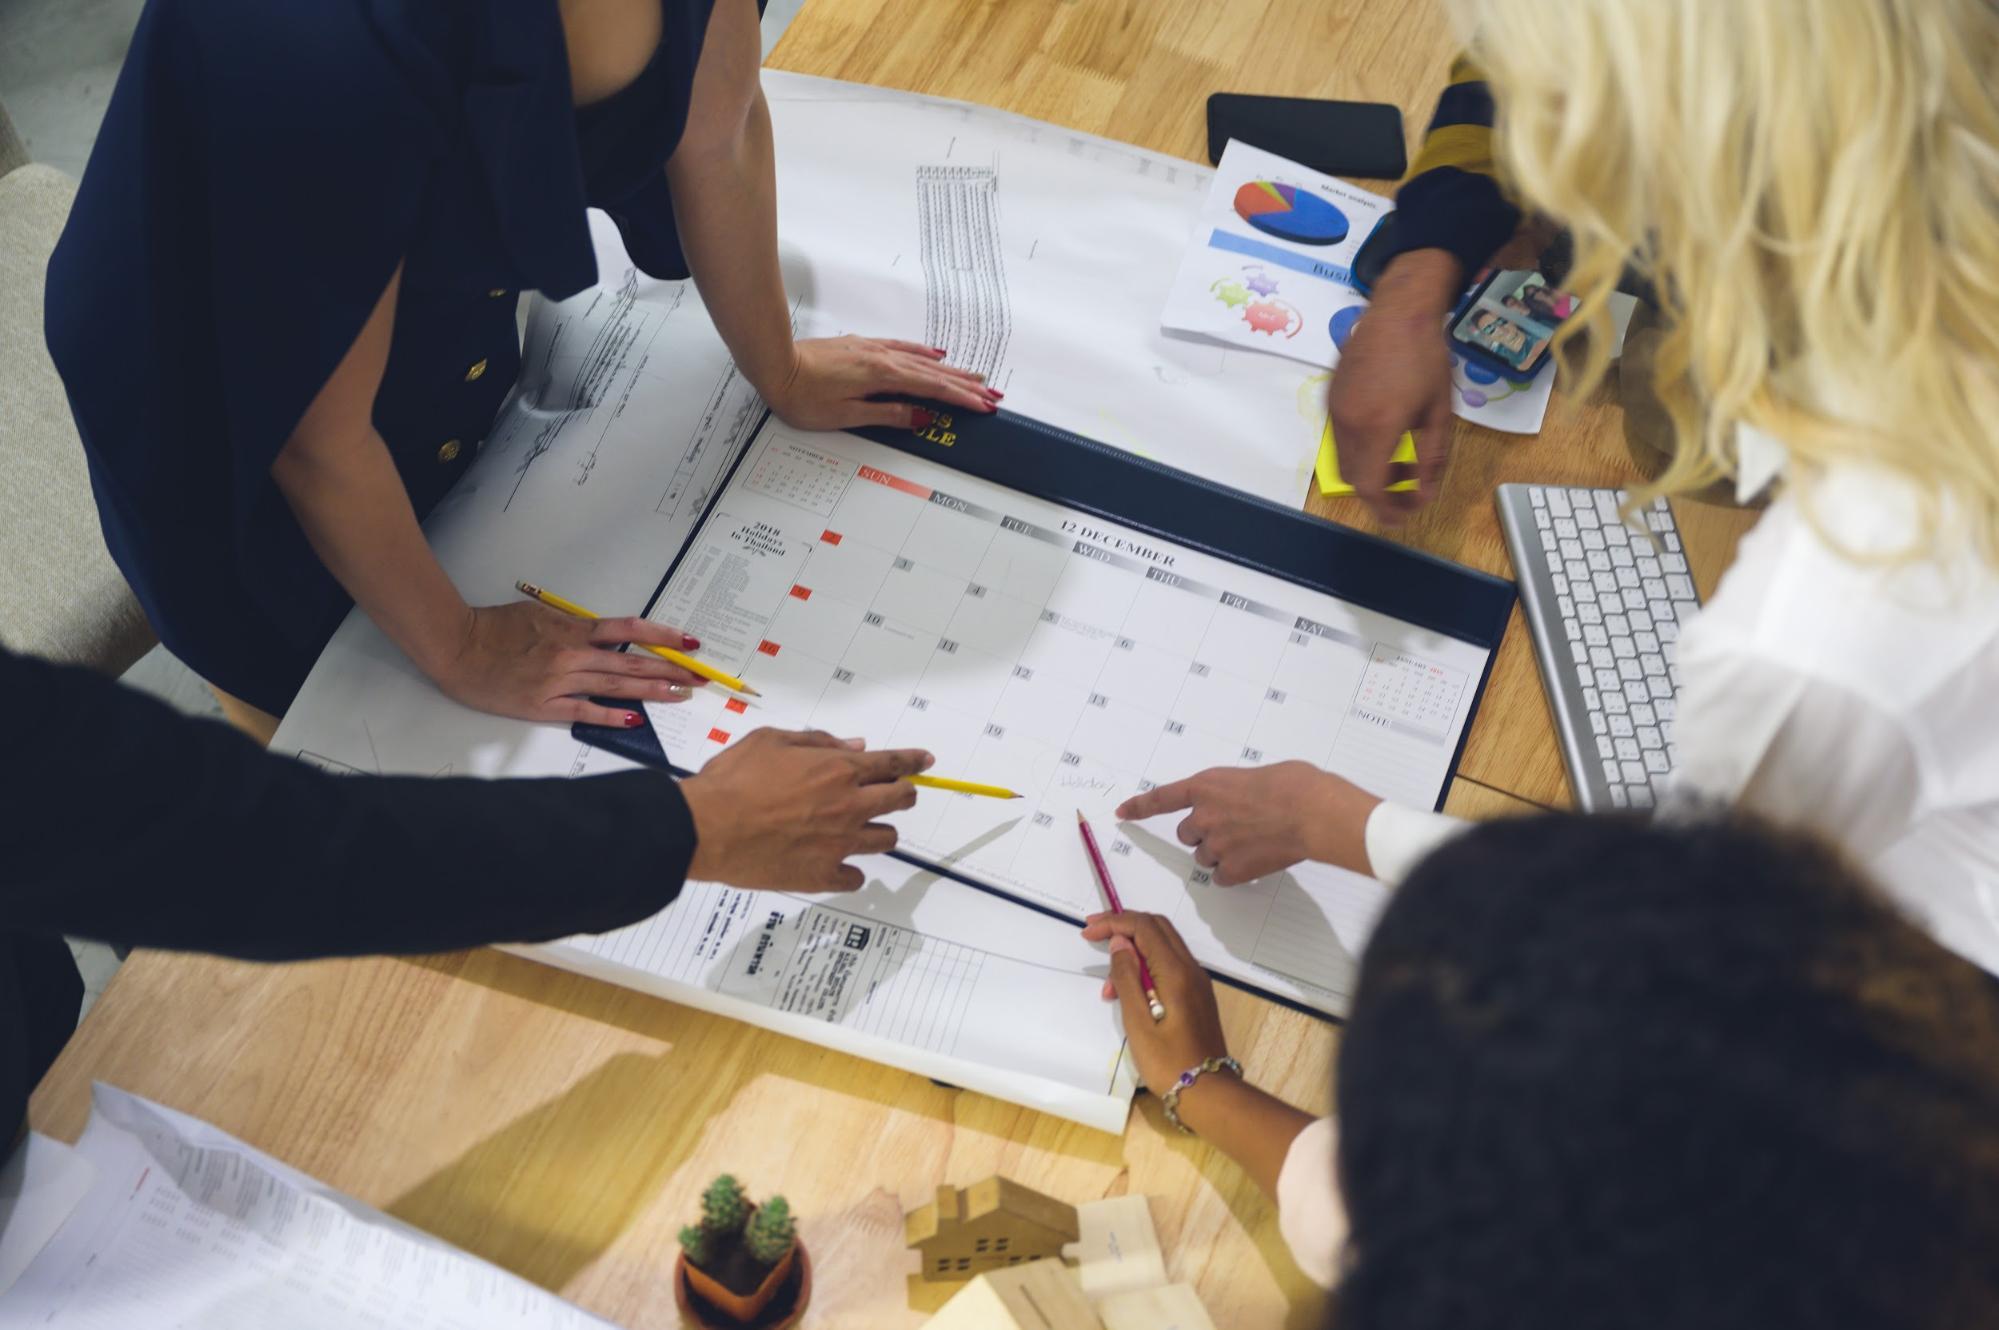 How long is an internship: Workmates discussing calendar schedule